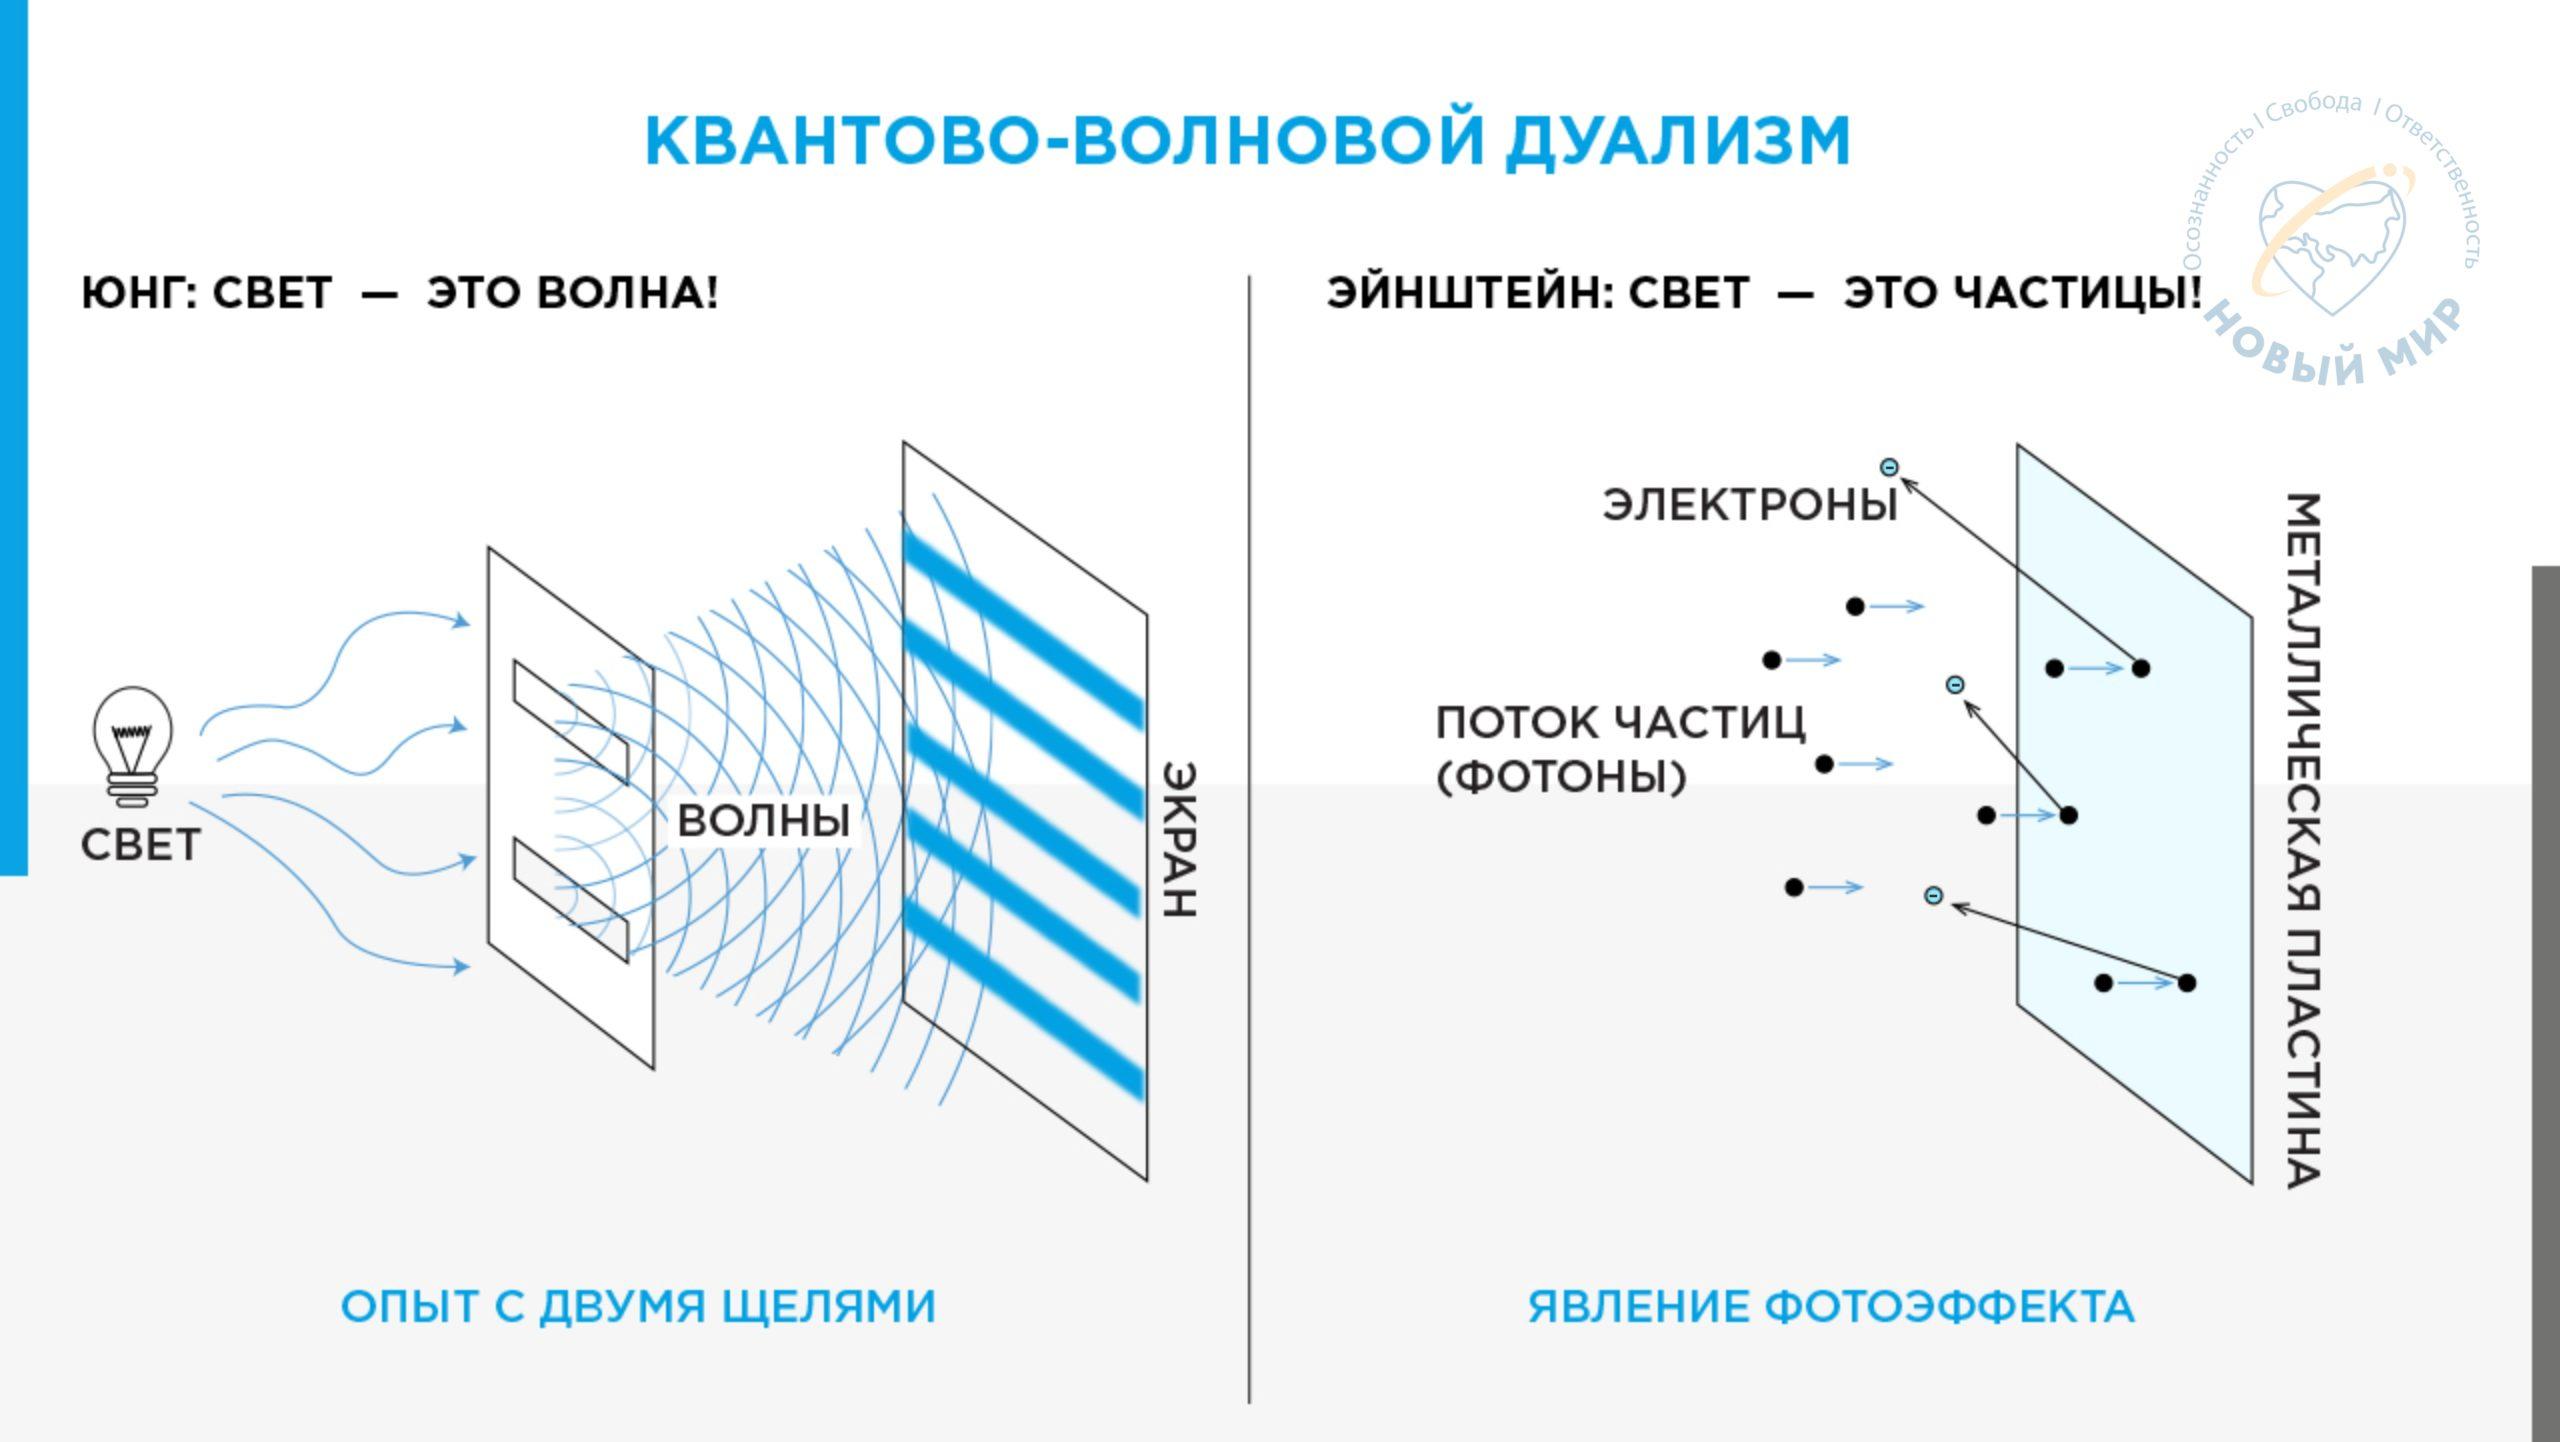 Skhema Kvantovo-volnovoj dualizm